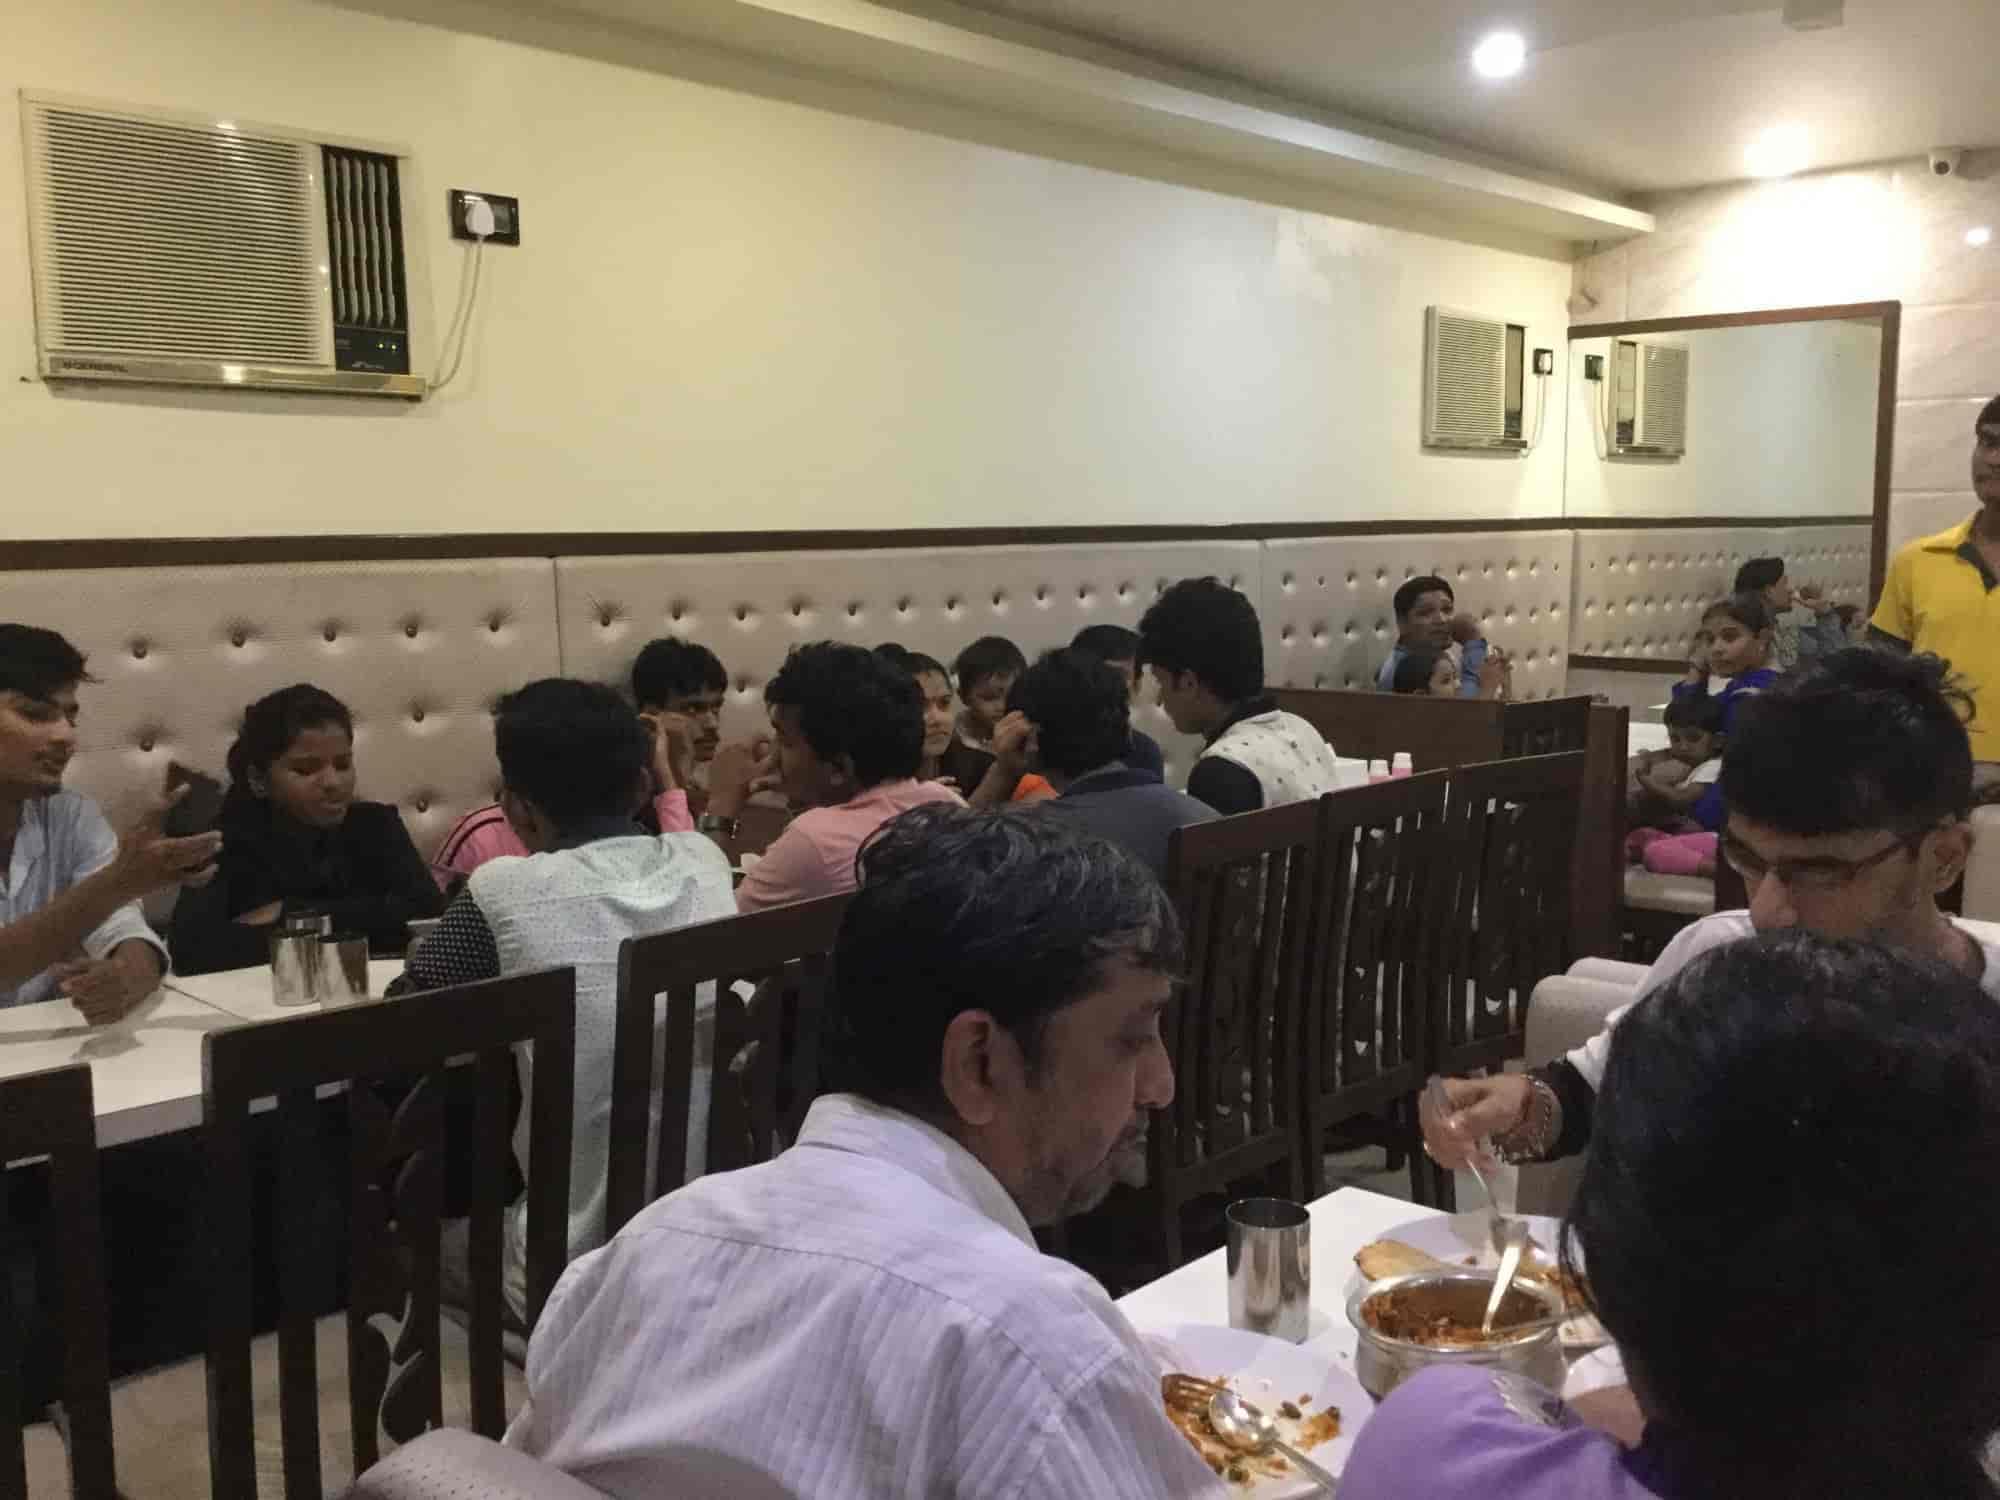 Hotel Shree Prabhu Niketan, Malad East, Mumbai - North